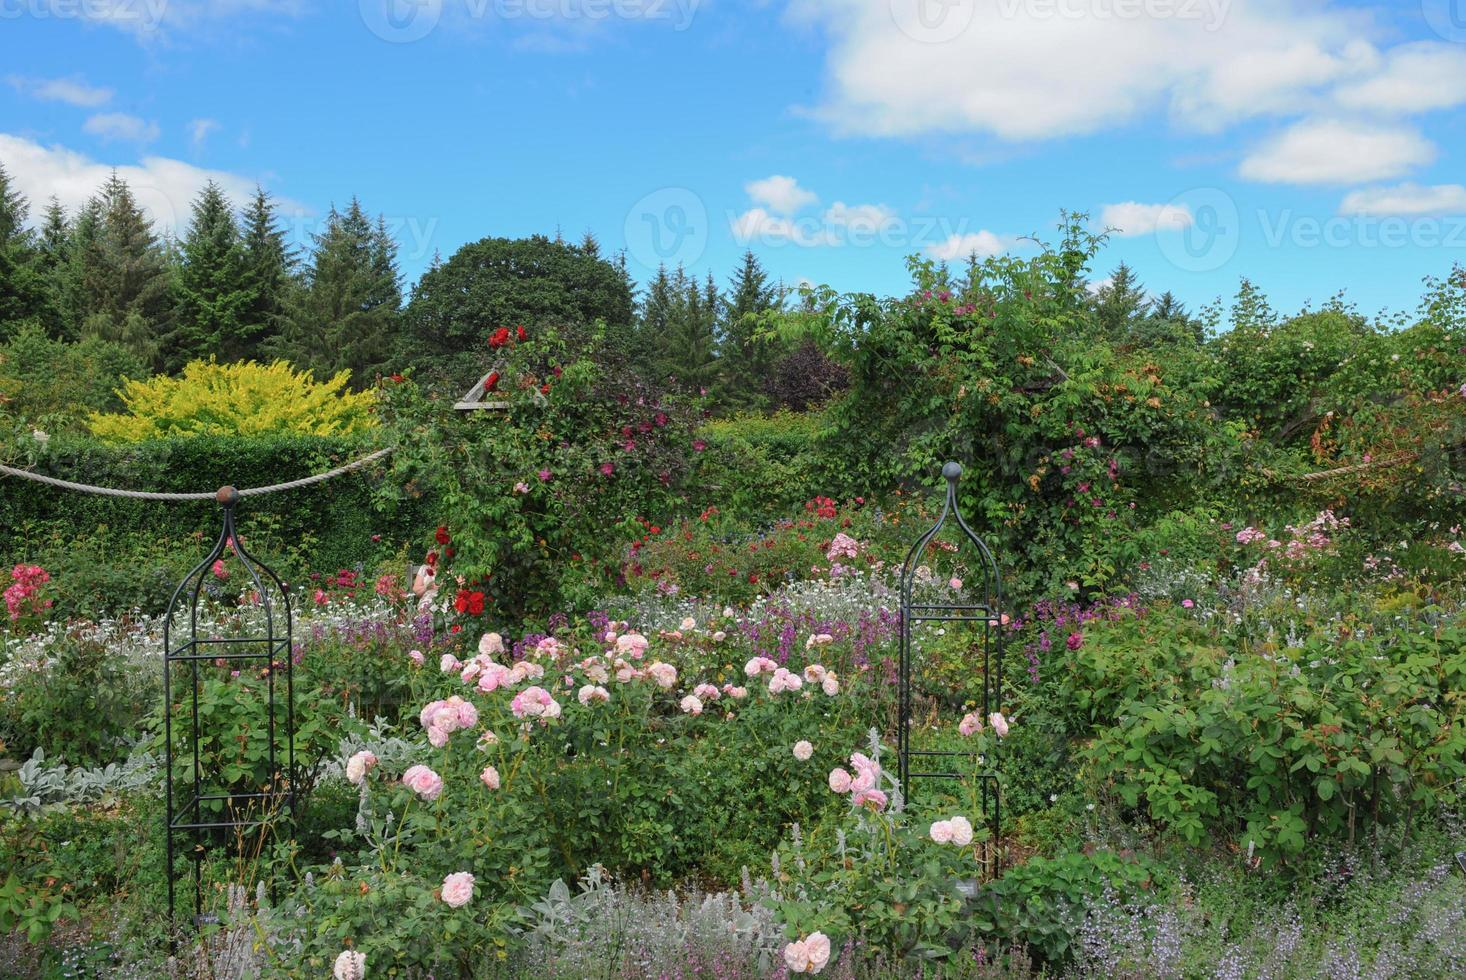 jardins em rosemore, torrington, em devon, inglaterra, reino unido foto